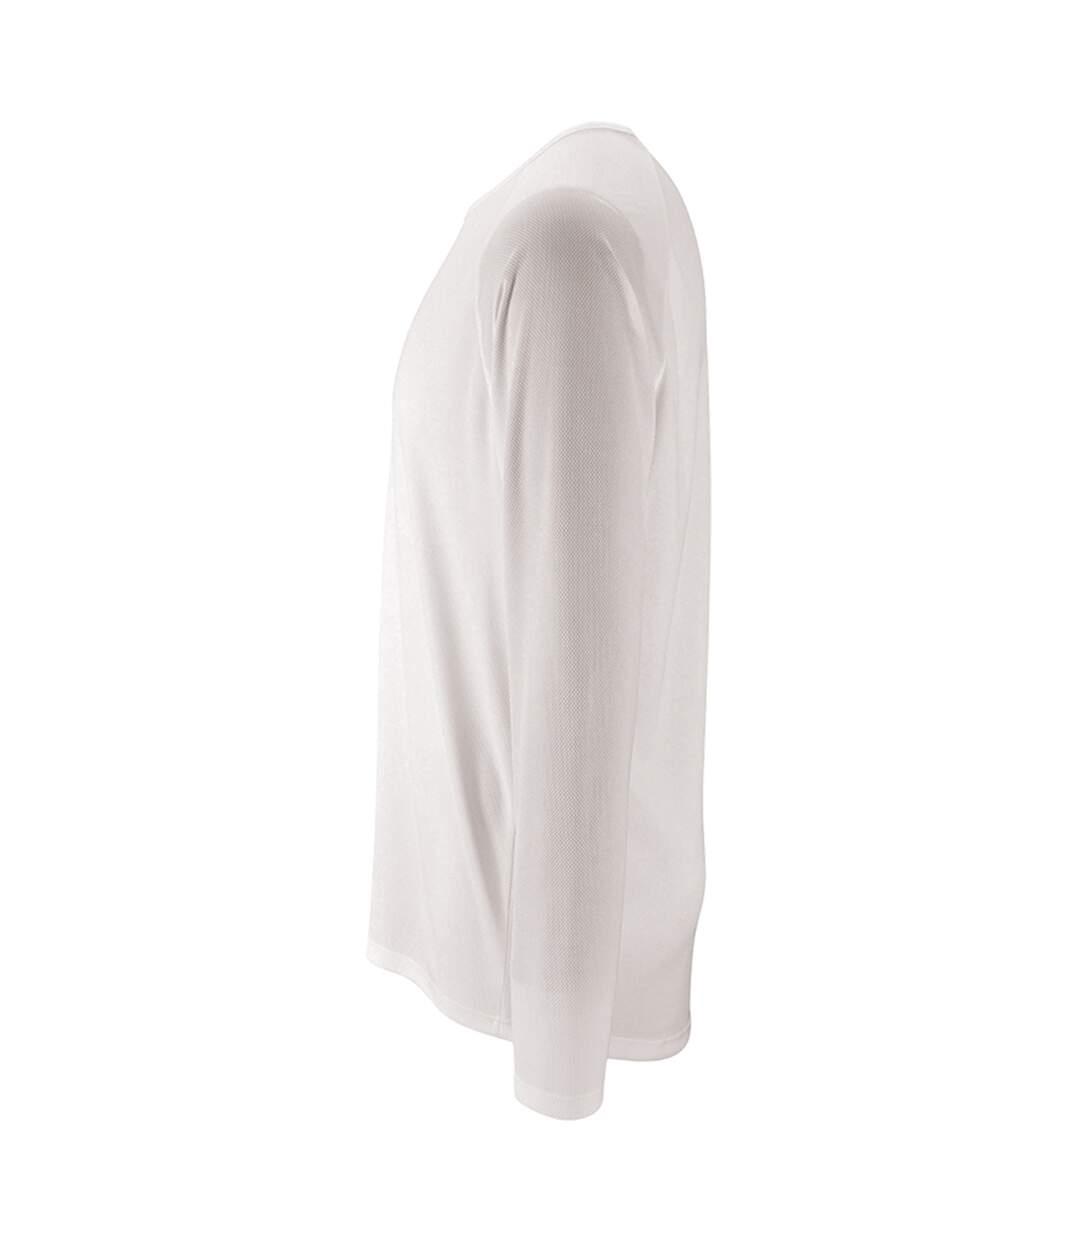 SOLS - T-shirt à manches longues PERFORMANCE - Homme (Blanc) - UTPC2903